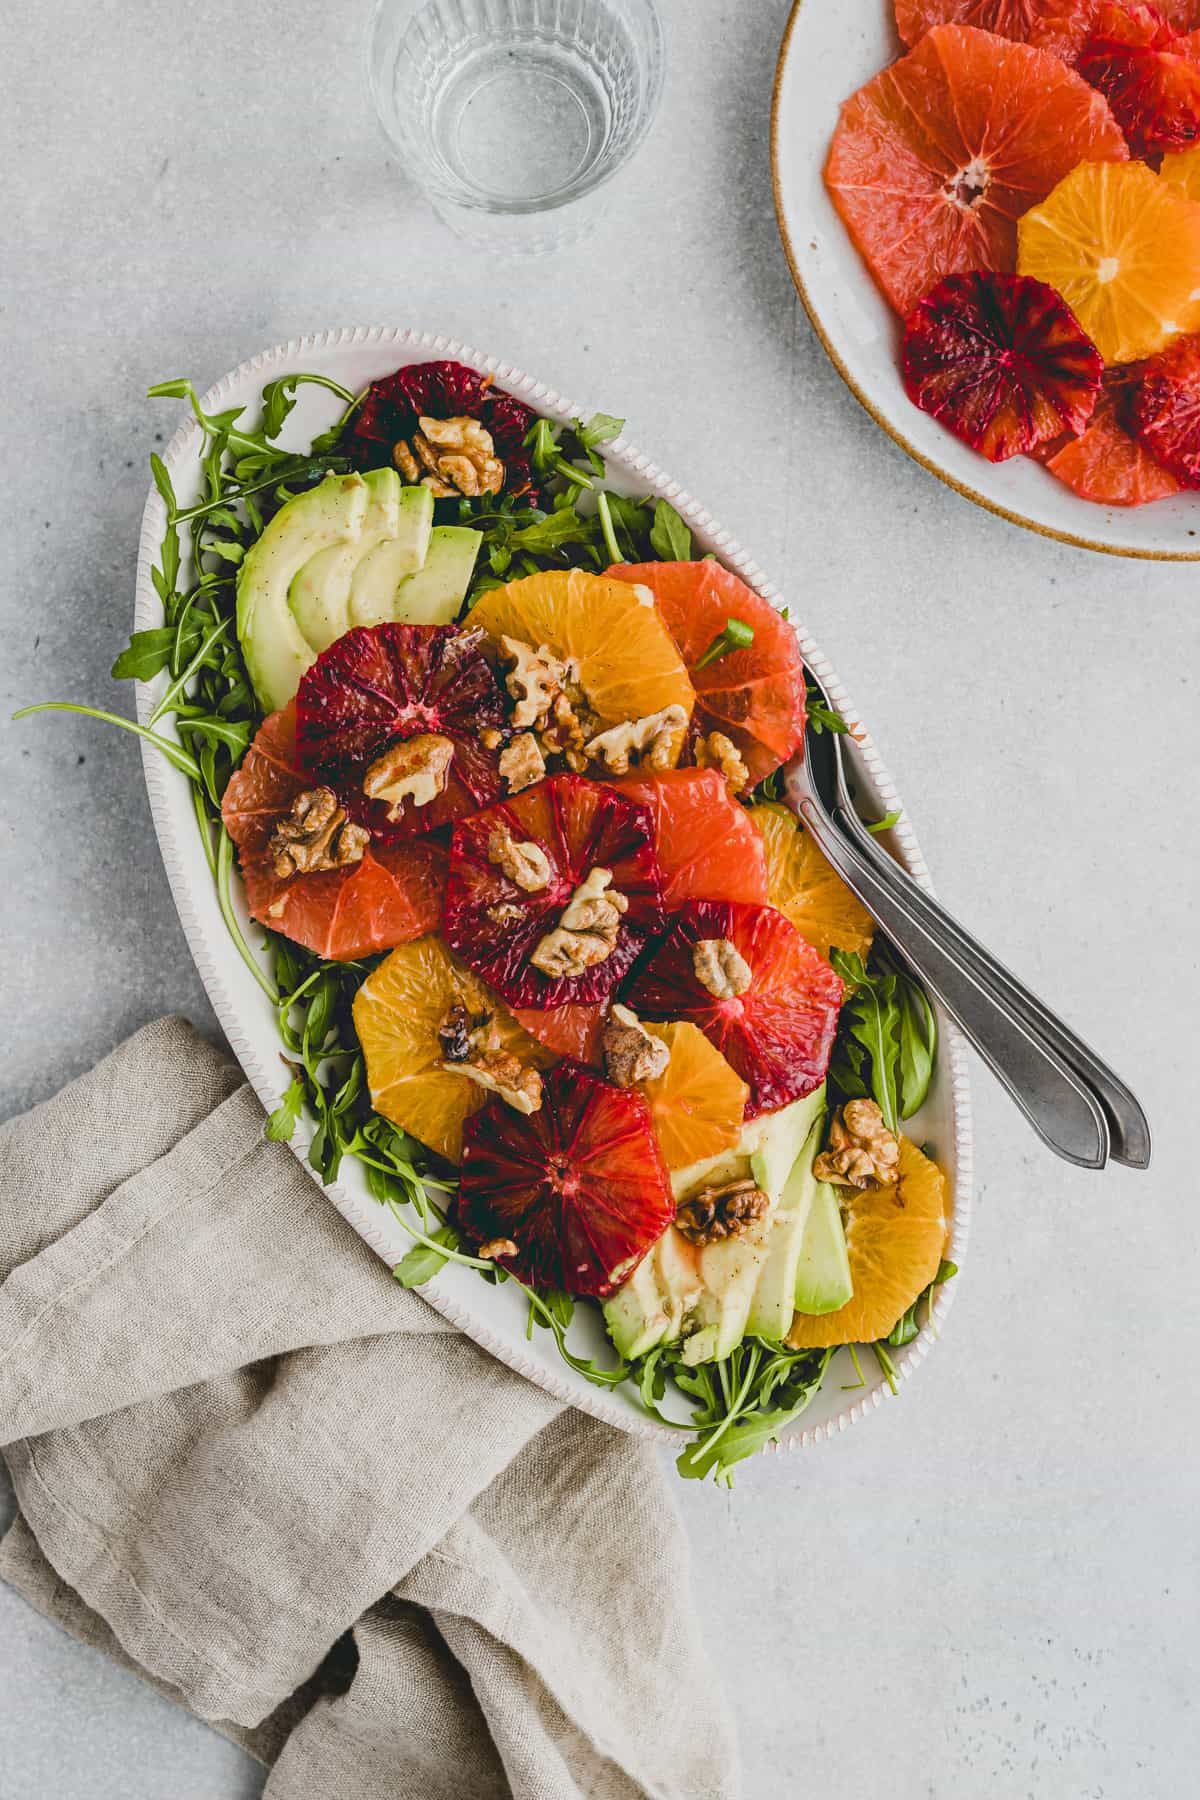 Winter Citrus Salad with Arugula and Avocado